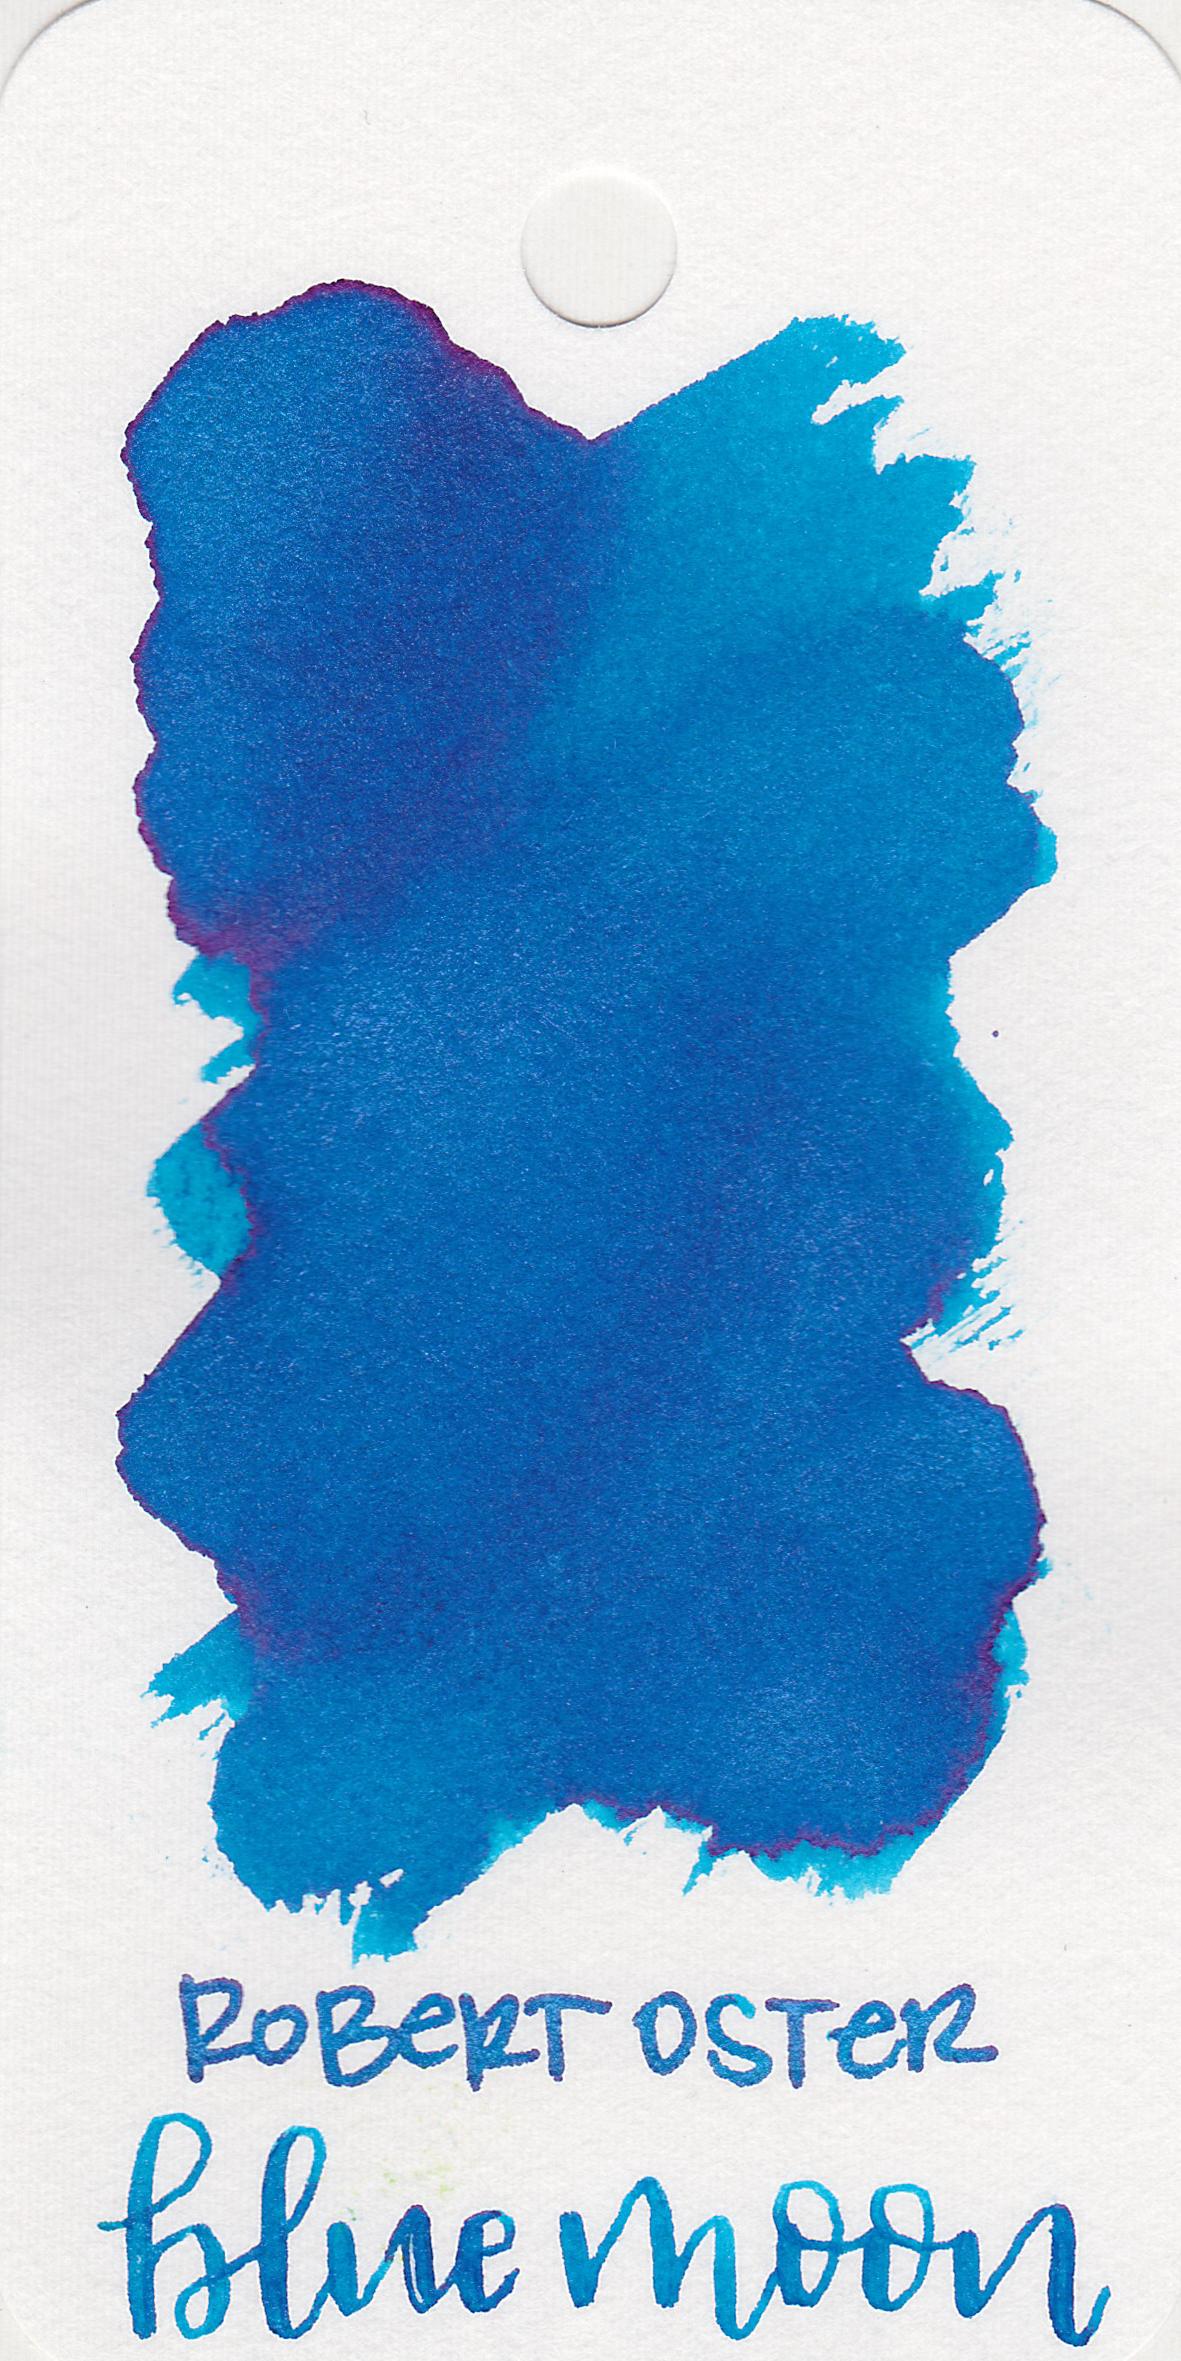 ro-blue-moon-1.jpg